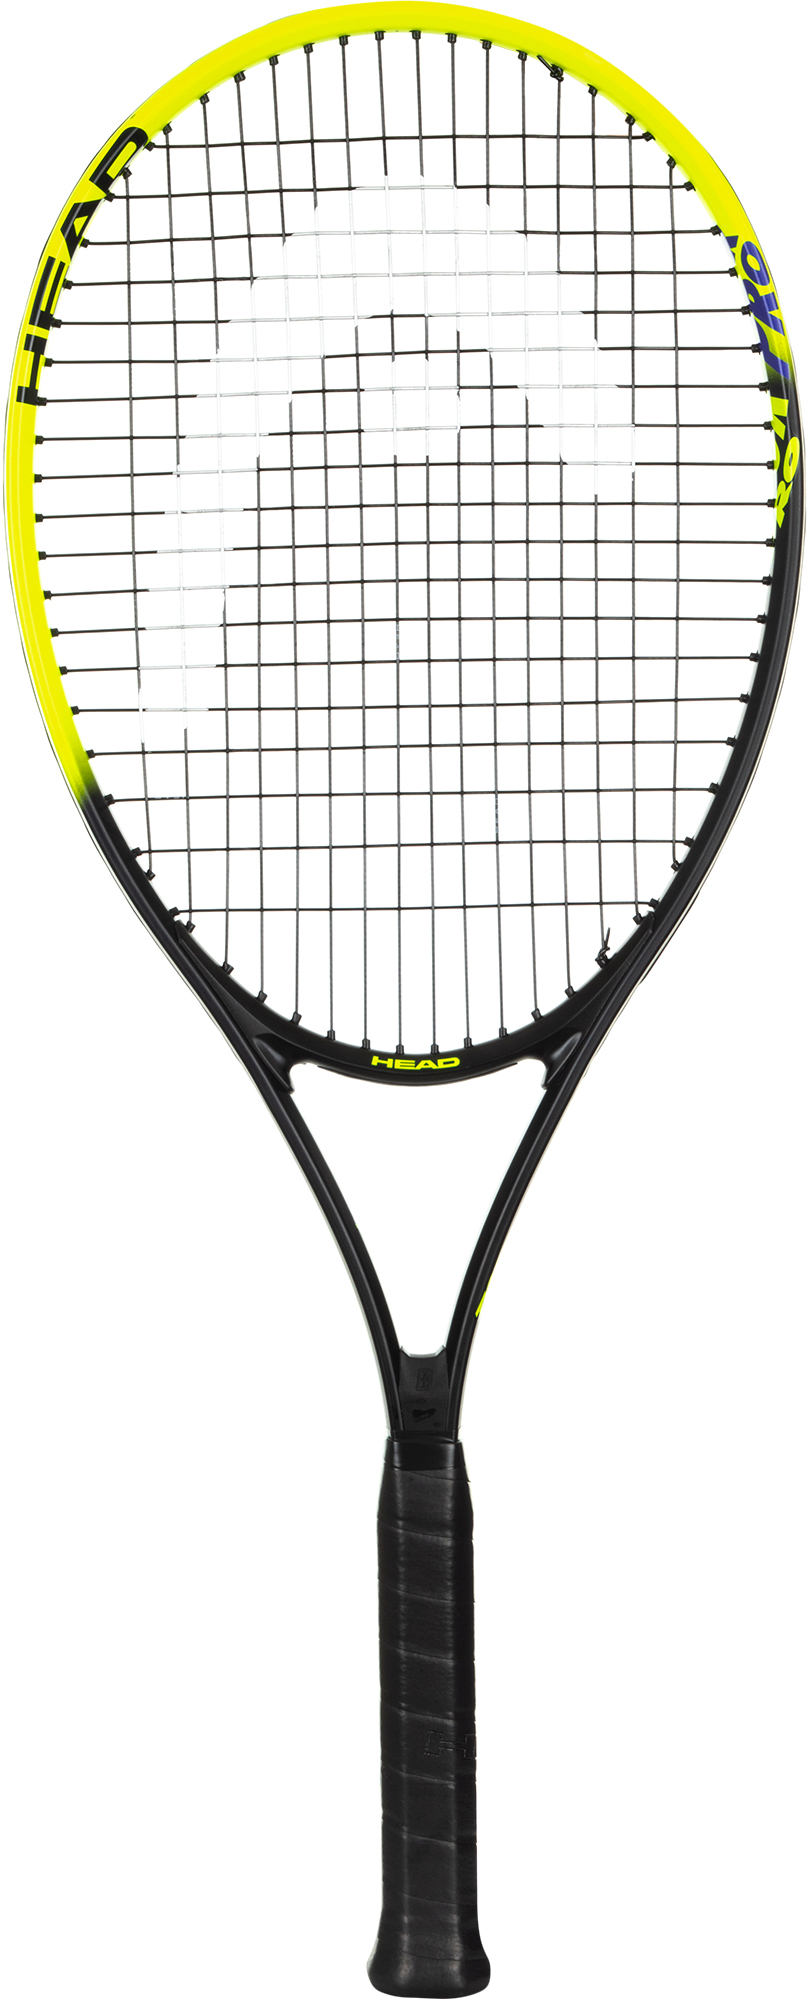 Head Ракетка для большого тенниса Head Tour Pro, размер 3 head ракетка для большого тенниса детская head novak 23 размер без размера